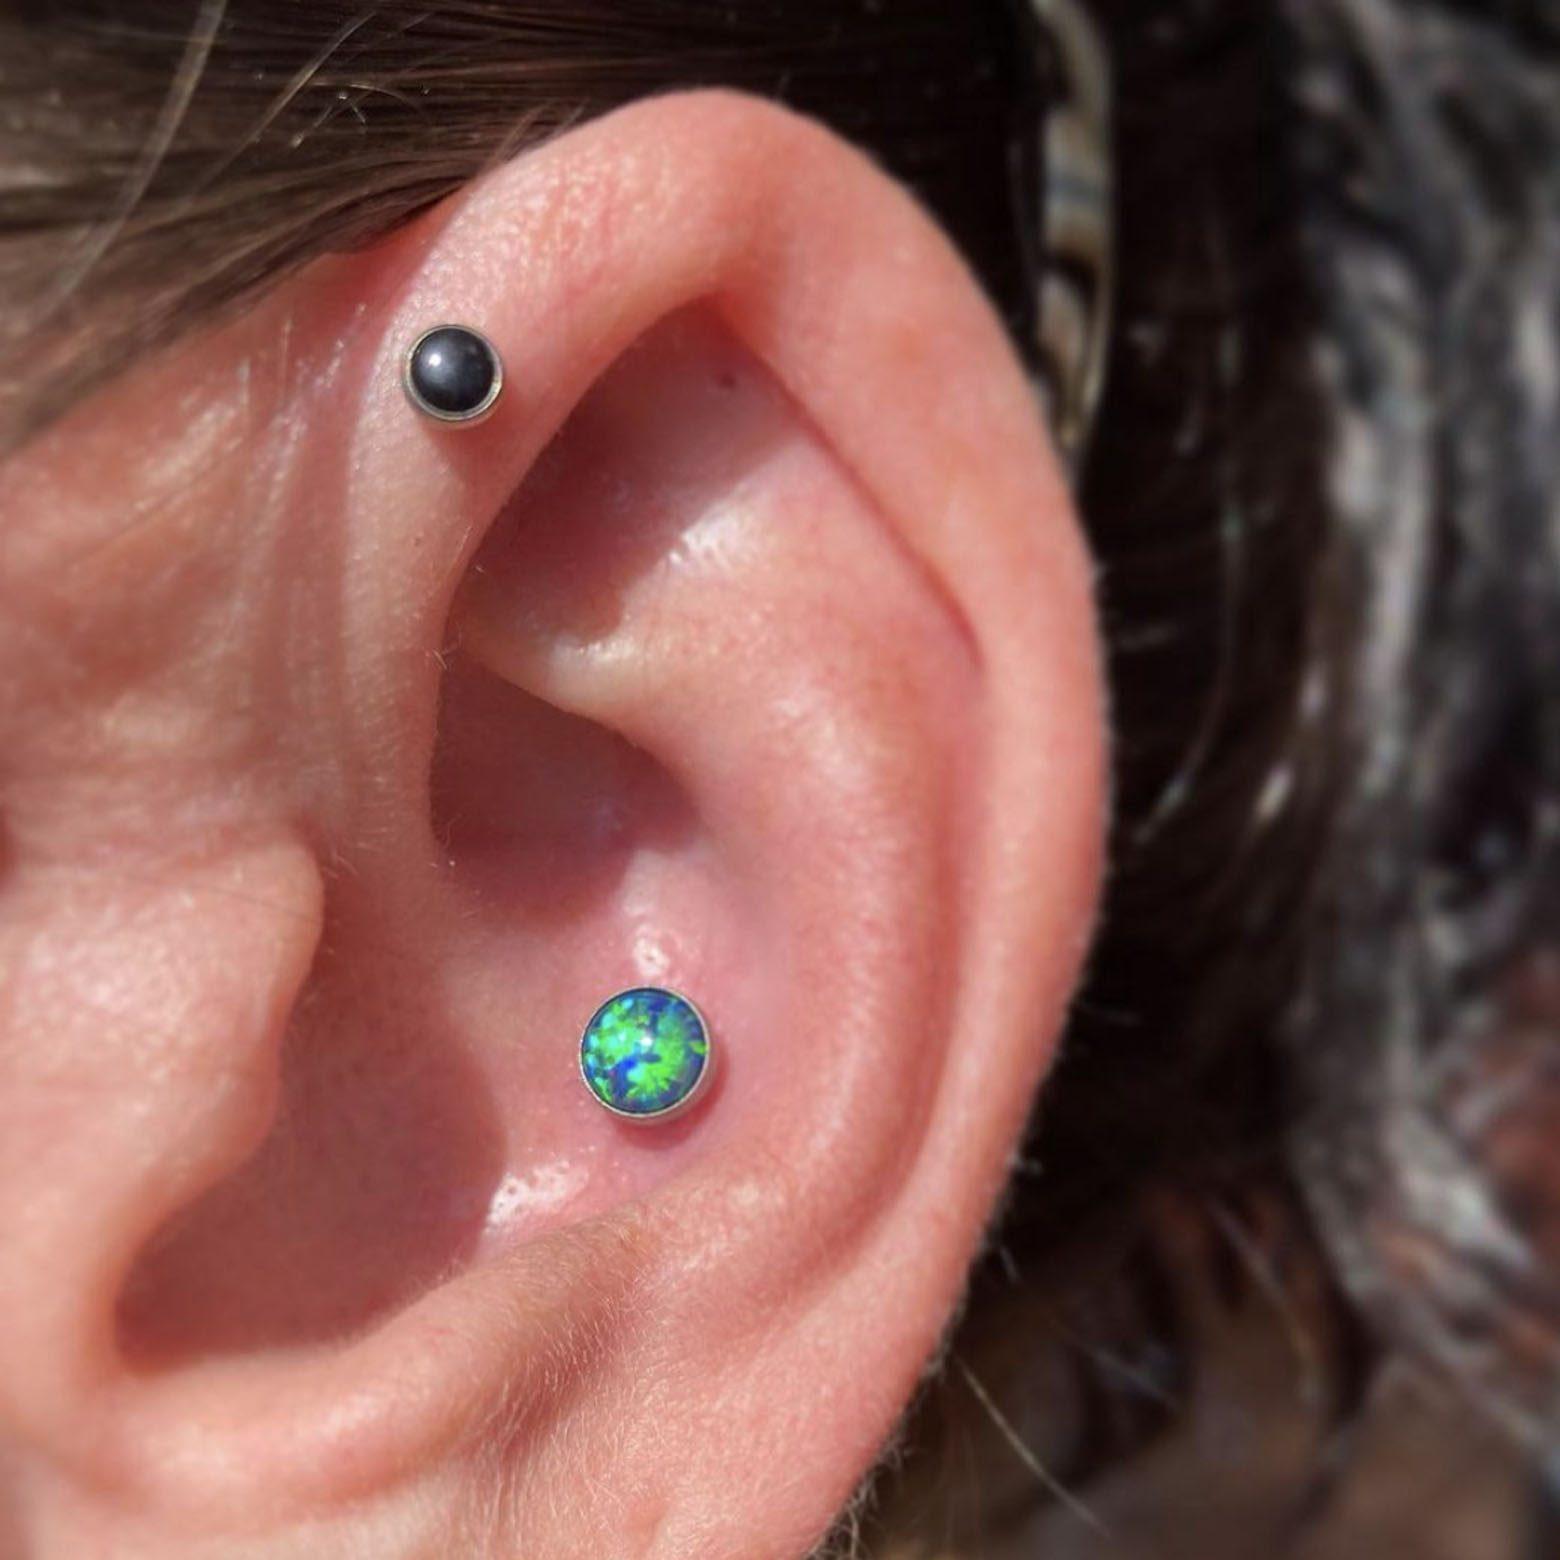 Photo of an ear piercing